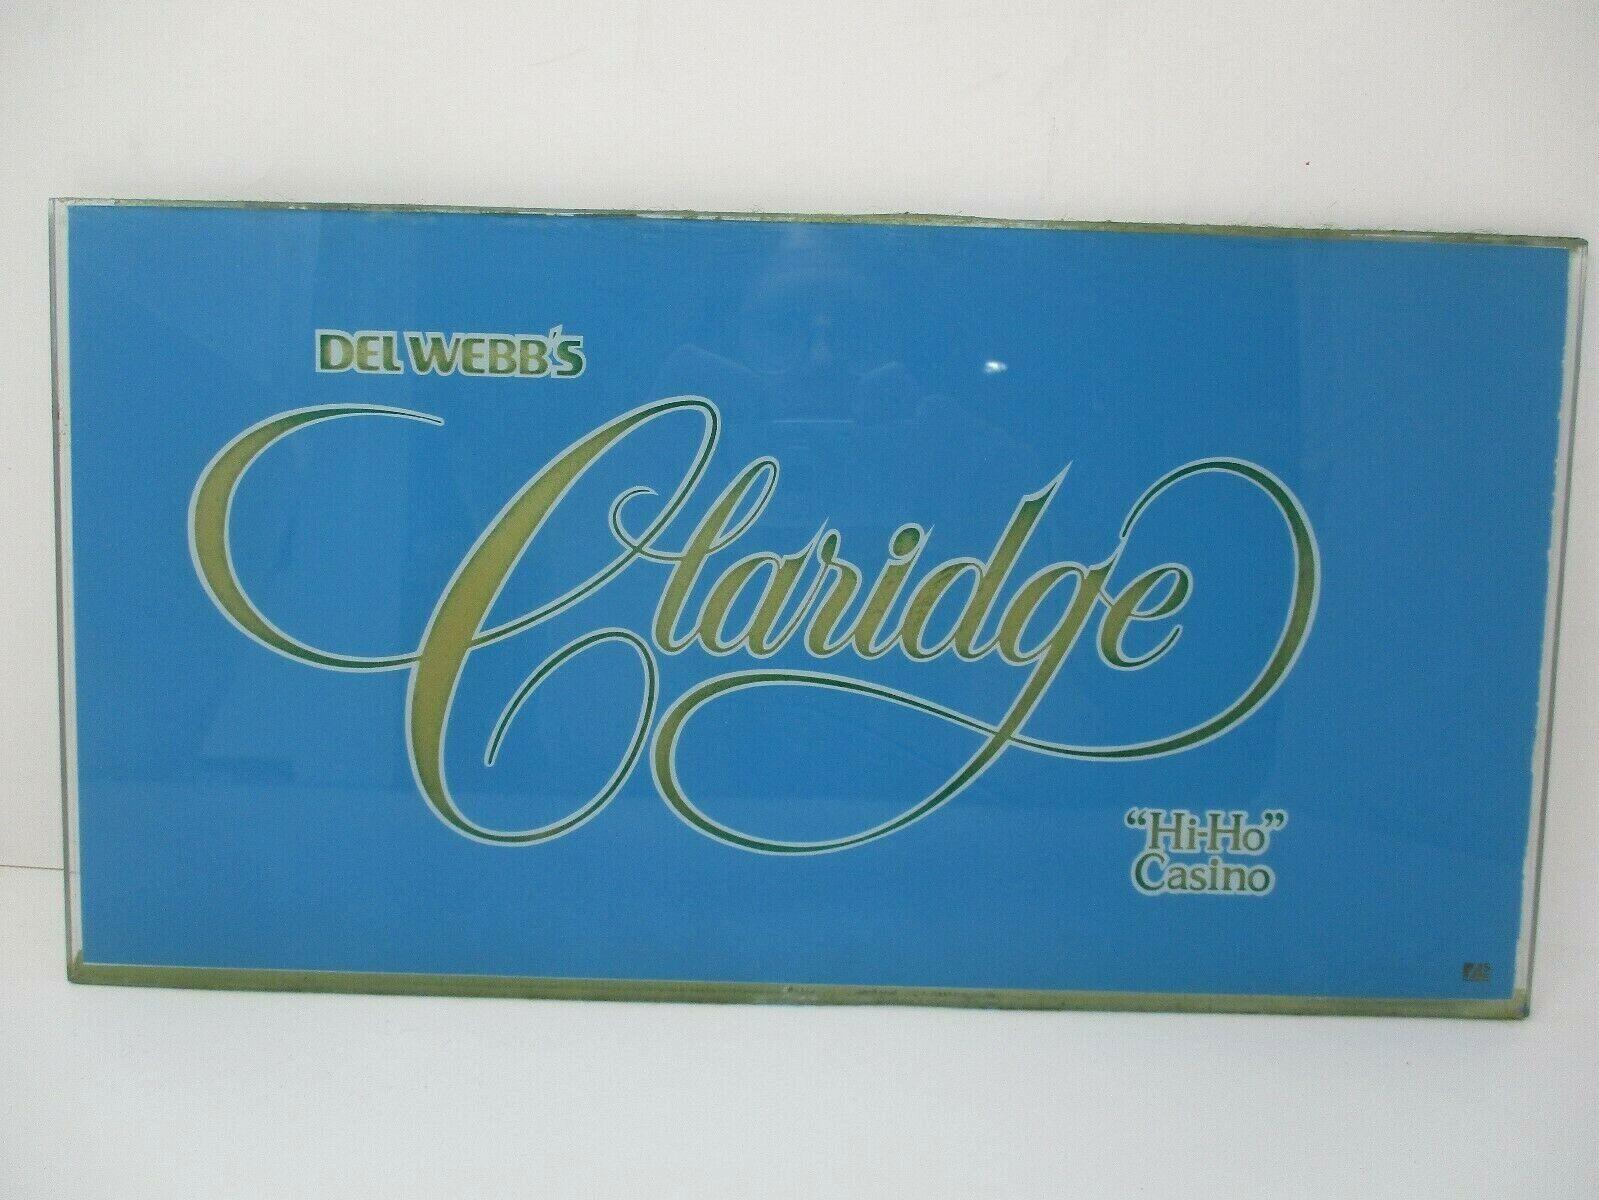 Claridge Hi-Ho Casino Retired Atlantic City Glass Slot Machine Front Face Plate